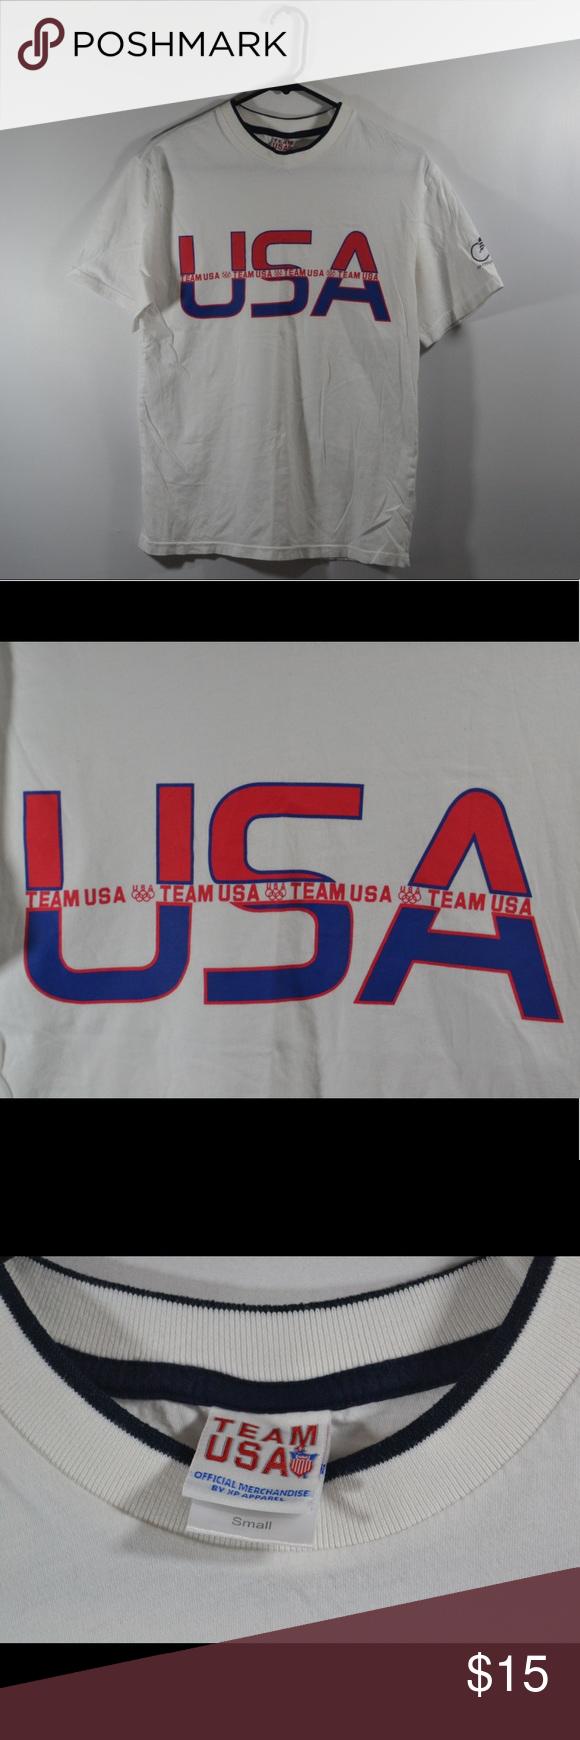 "Team USA Olympic Cycling T Shirt Team USA Olympic Cycling T Shirt. Measured in inches while laid flat. Chest:17.5"",Length:26"",Sleeve:8"" Tops Tees - Short Sleeve"